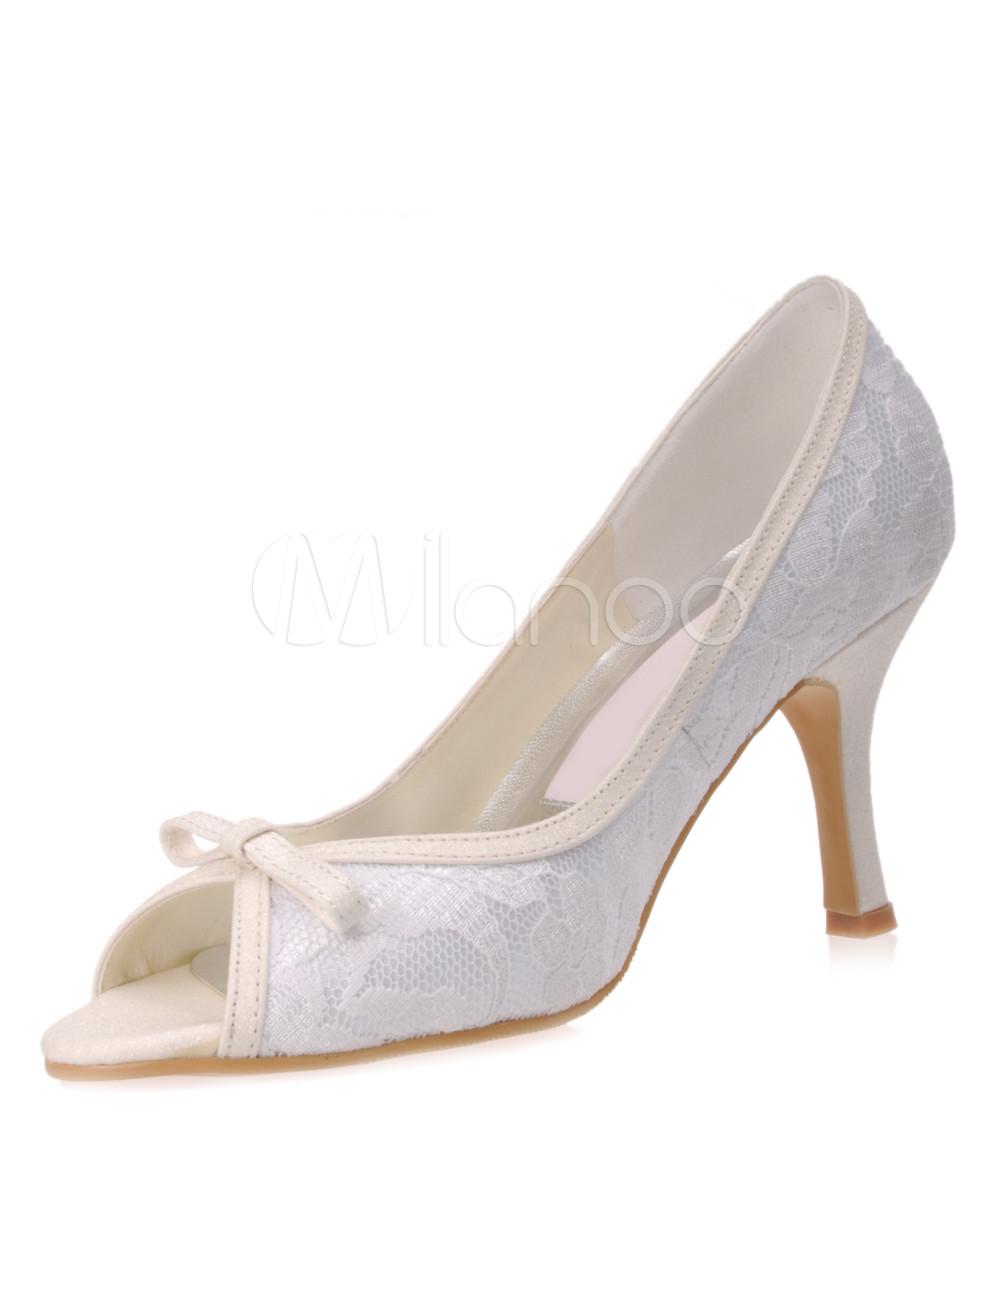 "Beautiful White Lace Satin 3 1 5"" High Heel Wedding Shoes"